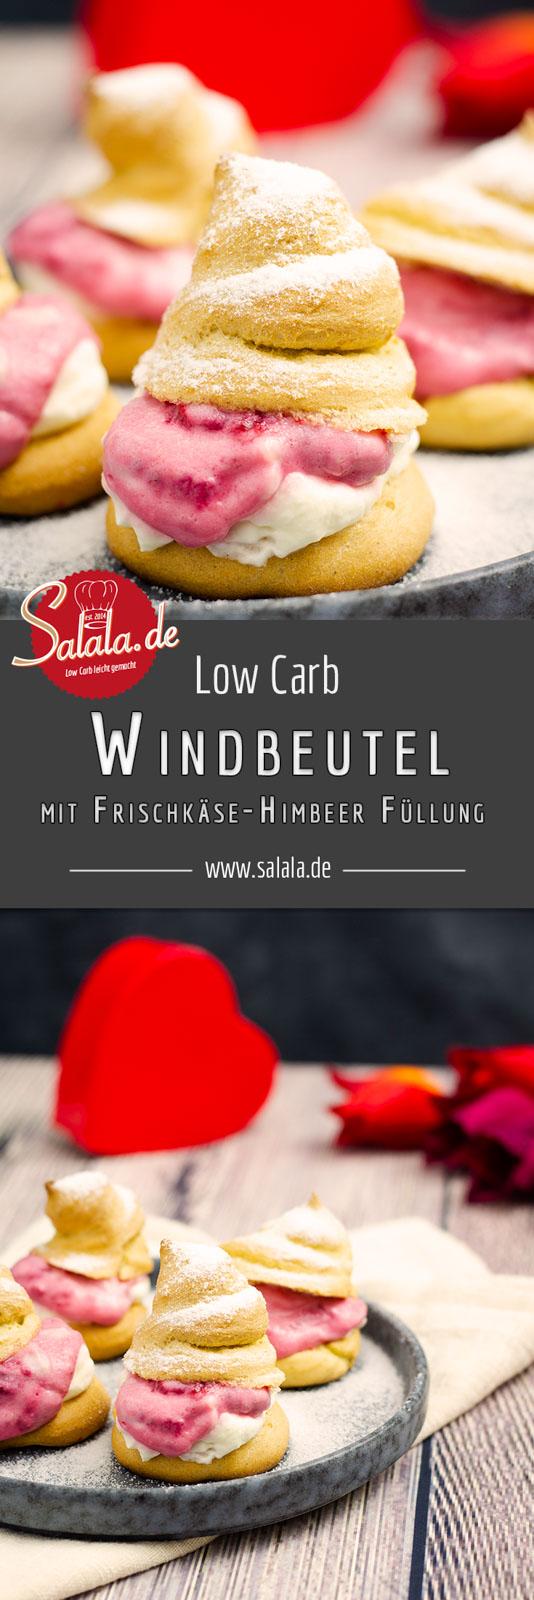 #windbeutel #windbeutelohnemehl #lowcarbwindbeutel #ohnezucker #valentinstag #lowcarb #rezepte #lowcarbrezepte